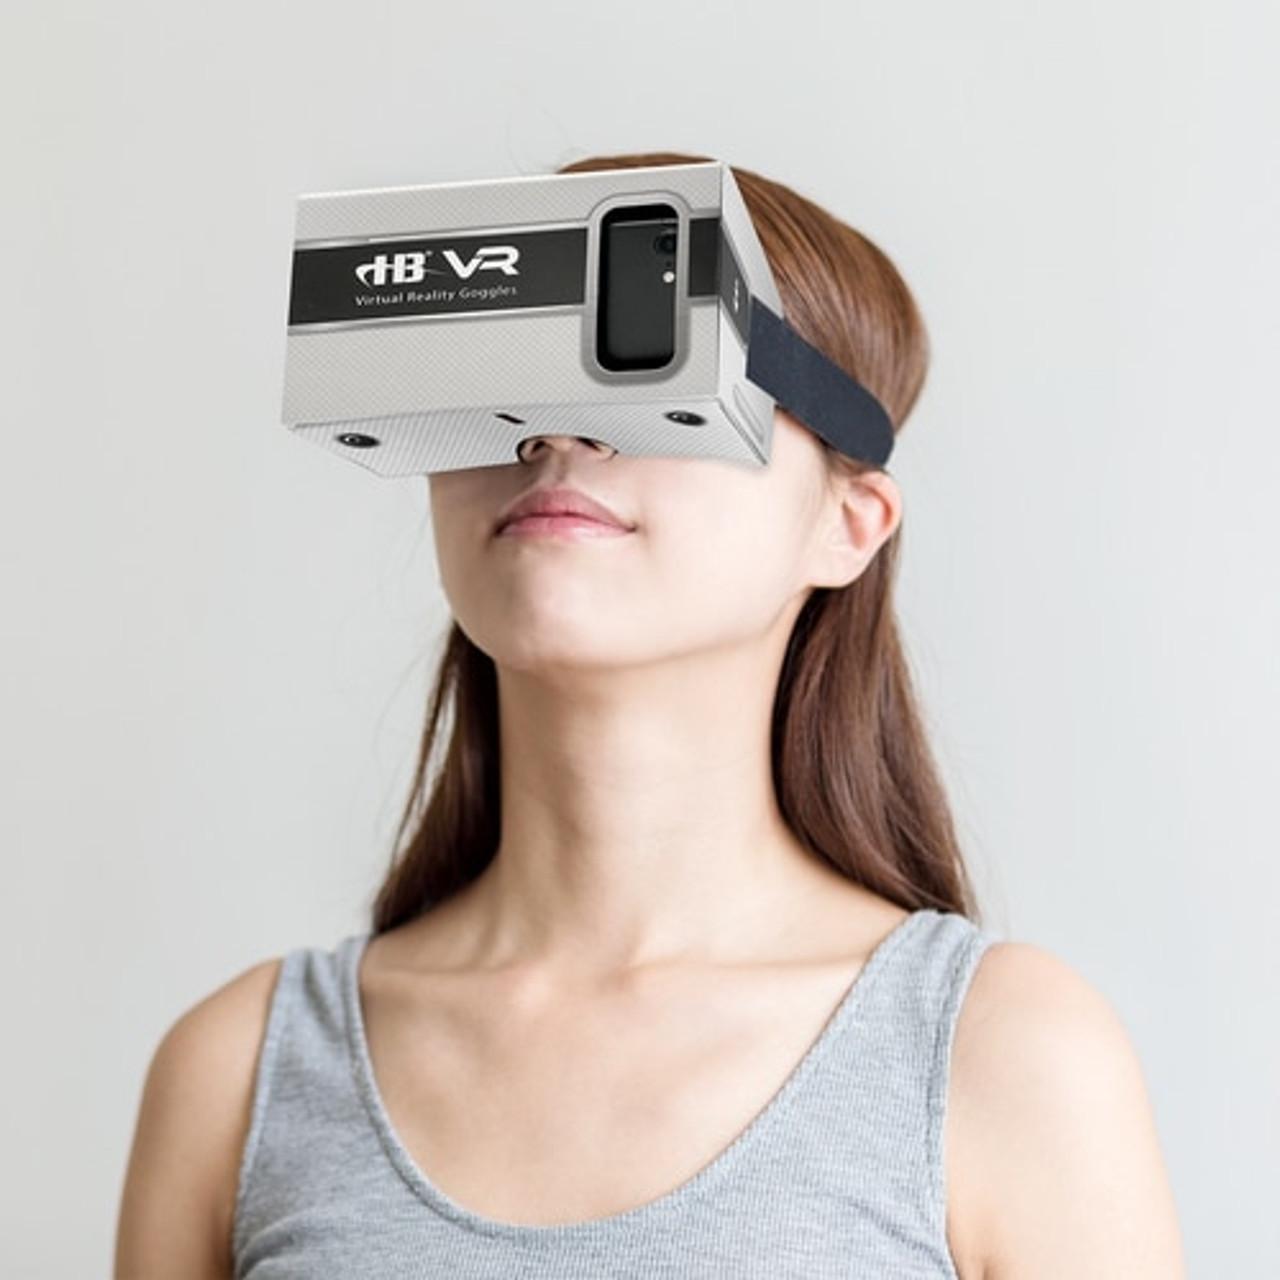 Hamiltonbuhl 3d Virtual Reality Diy Cardboard Goggles For Smartphones